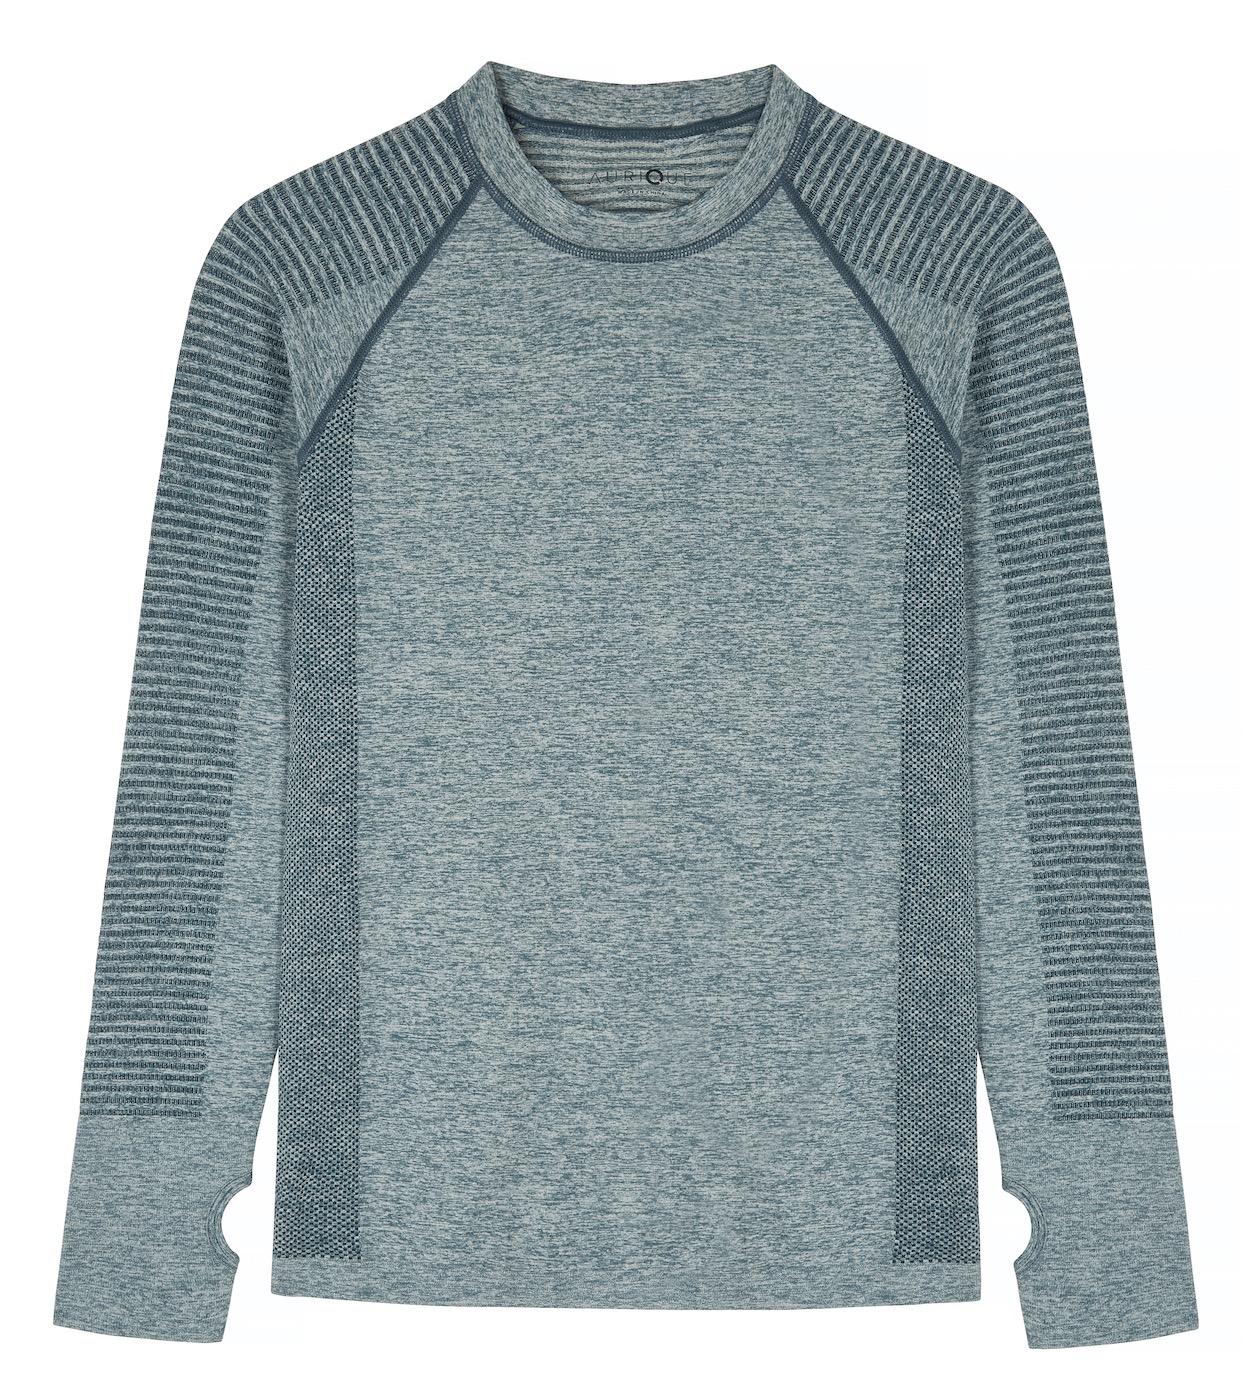 Amazon active wear long sleeved top